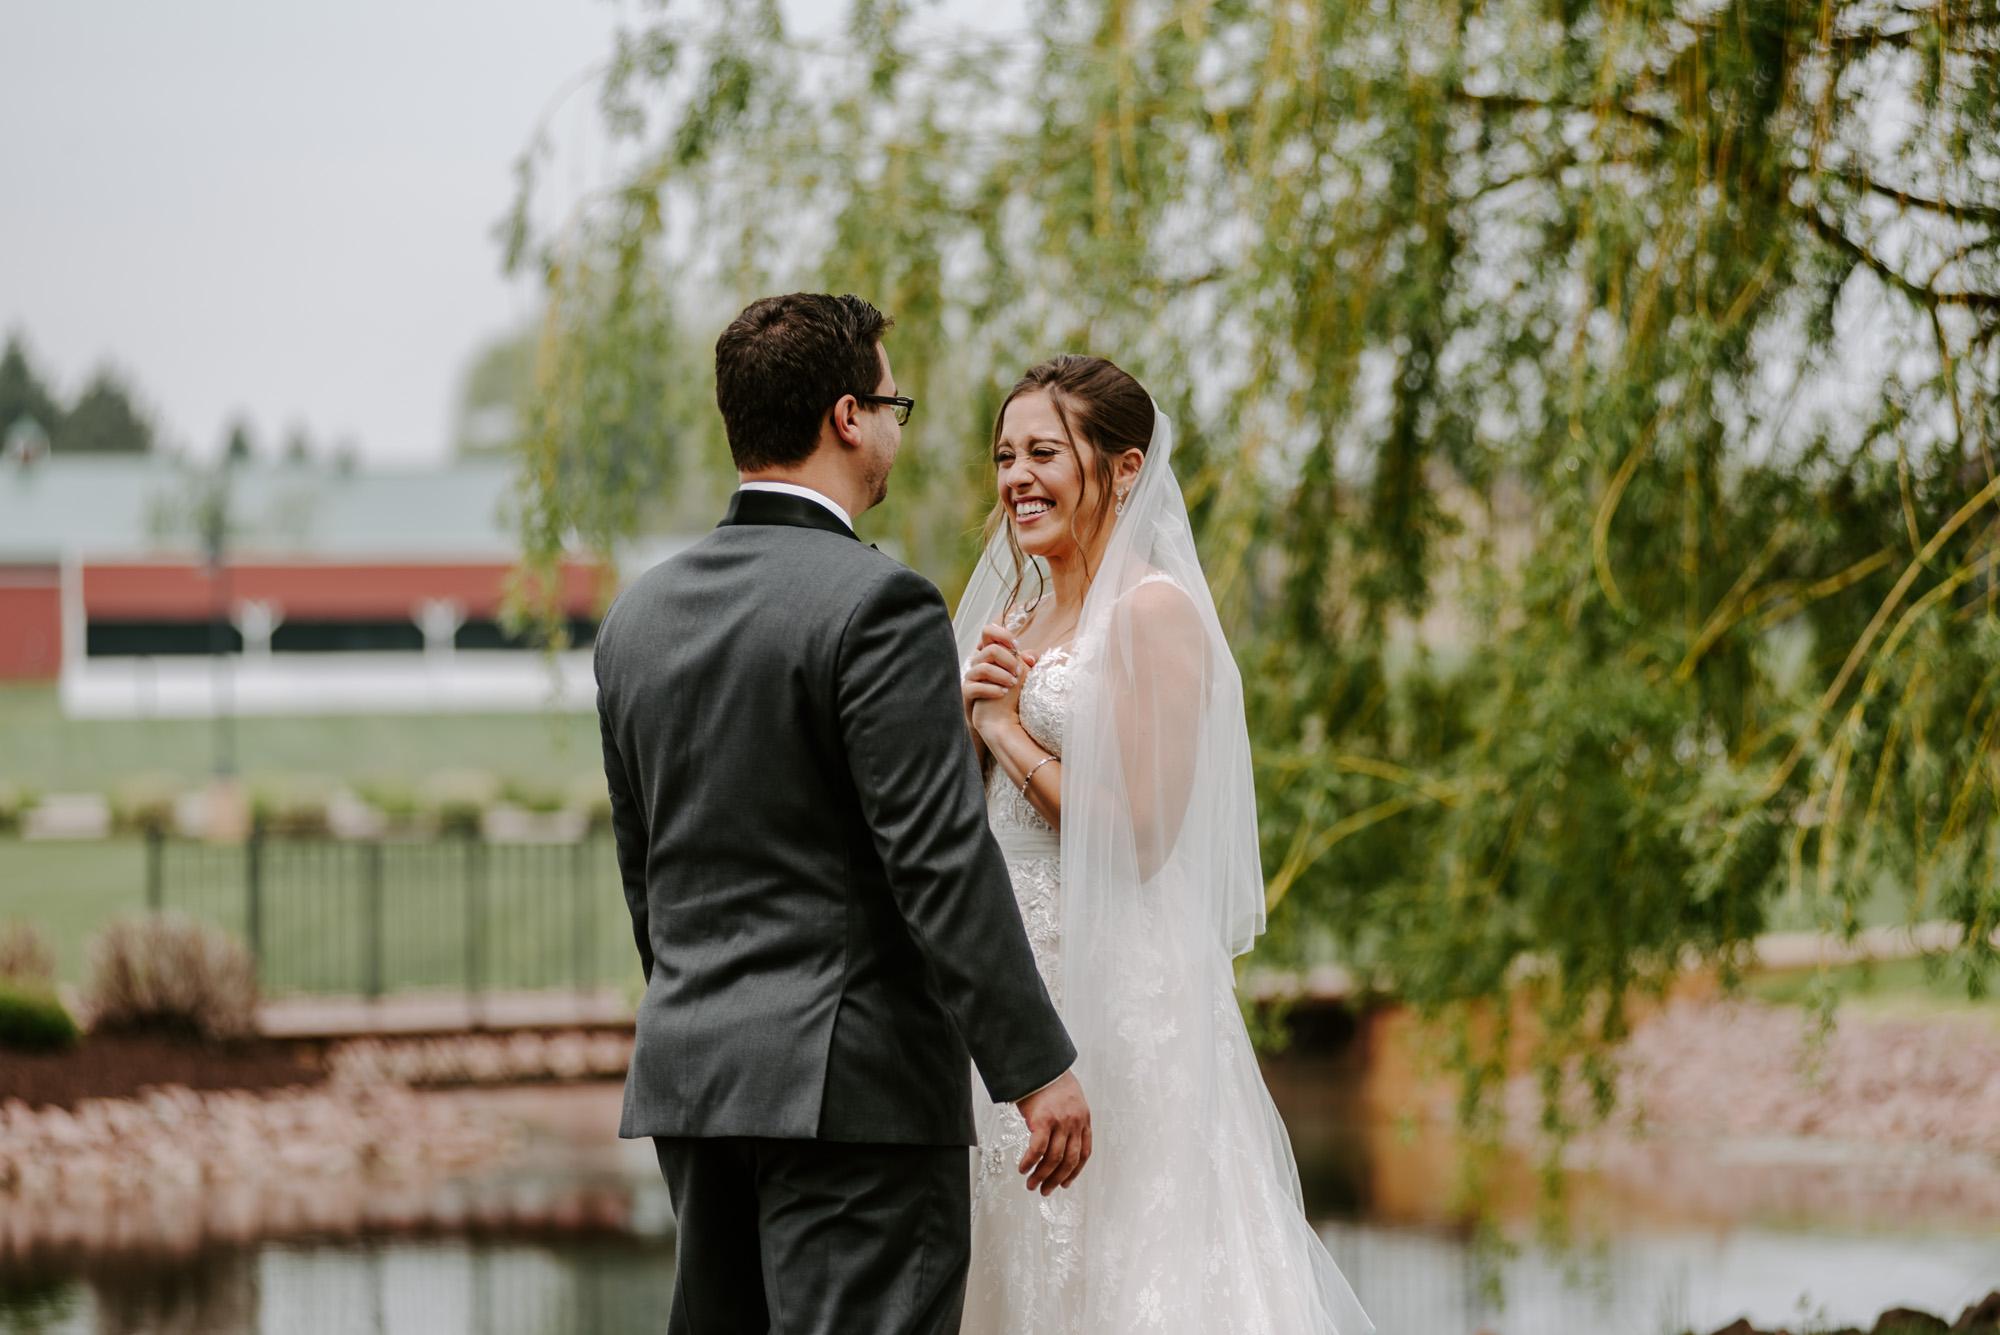 orchard-farms-pavillion-wedding-rockton-IL-wedding-photographers-94.jpg